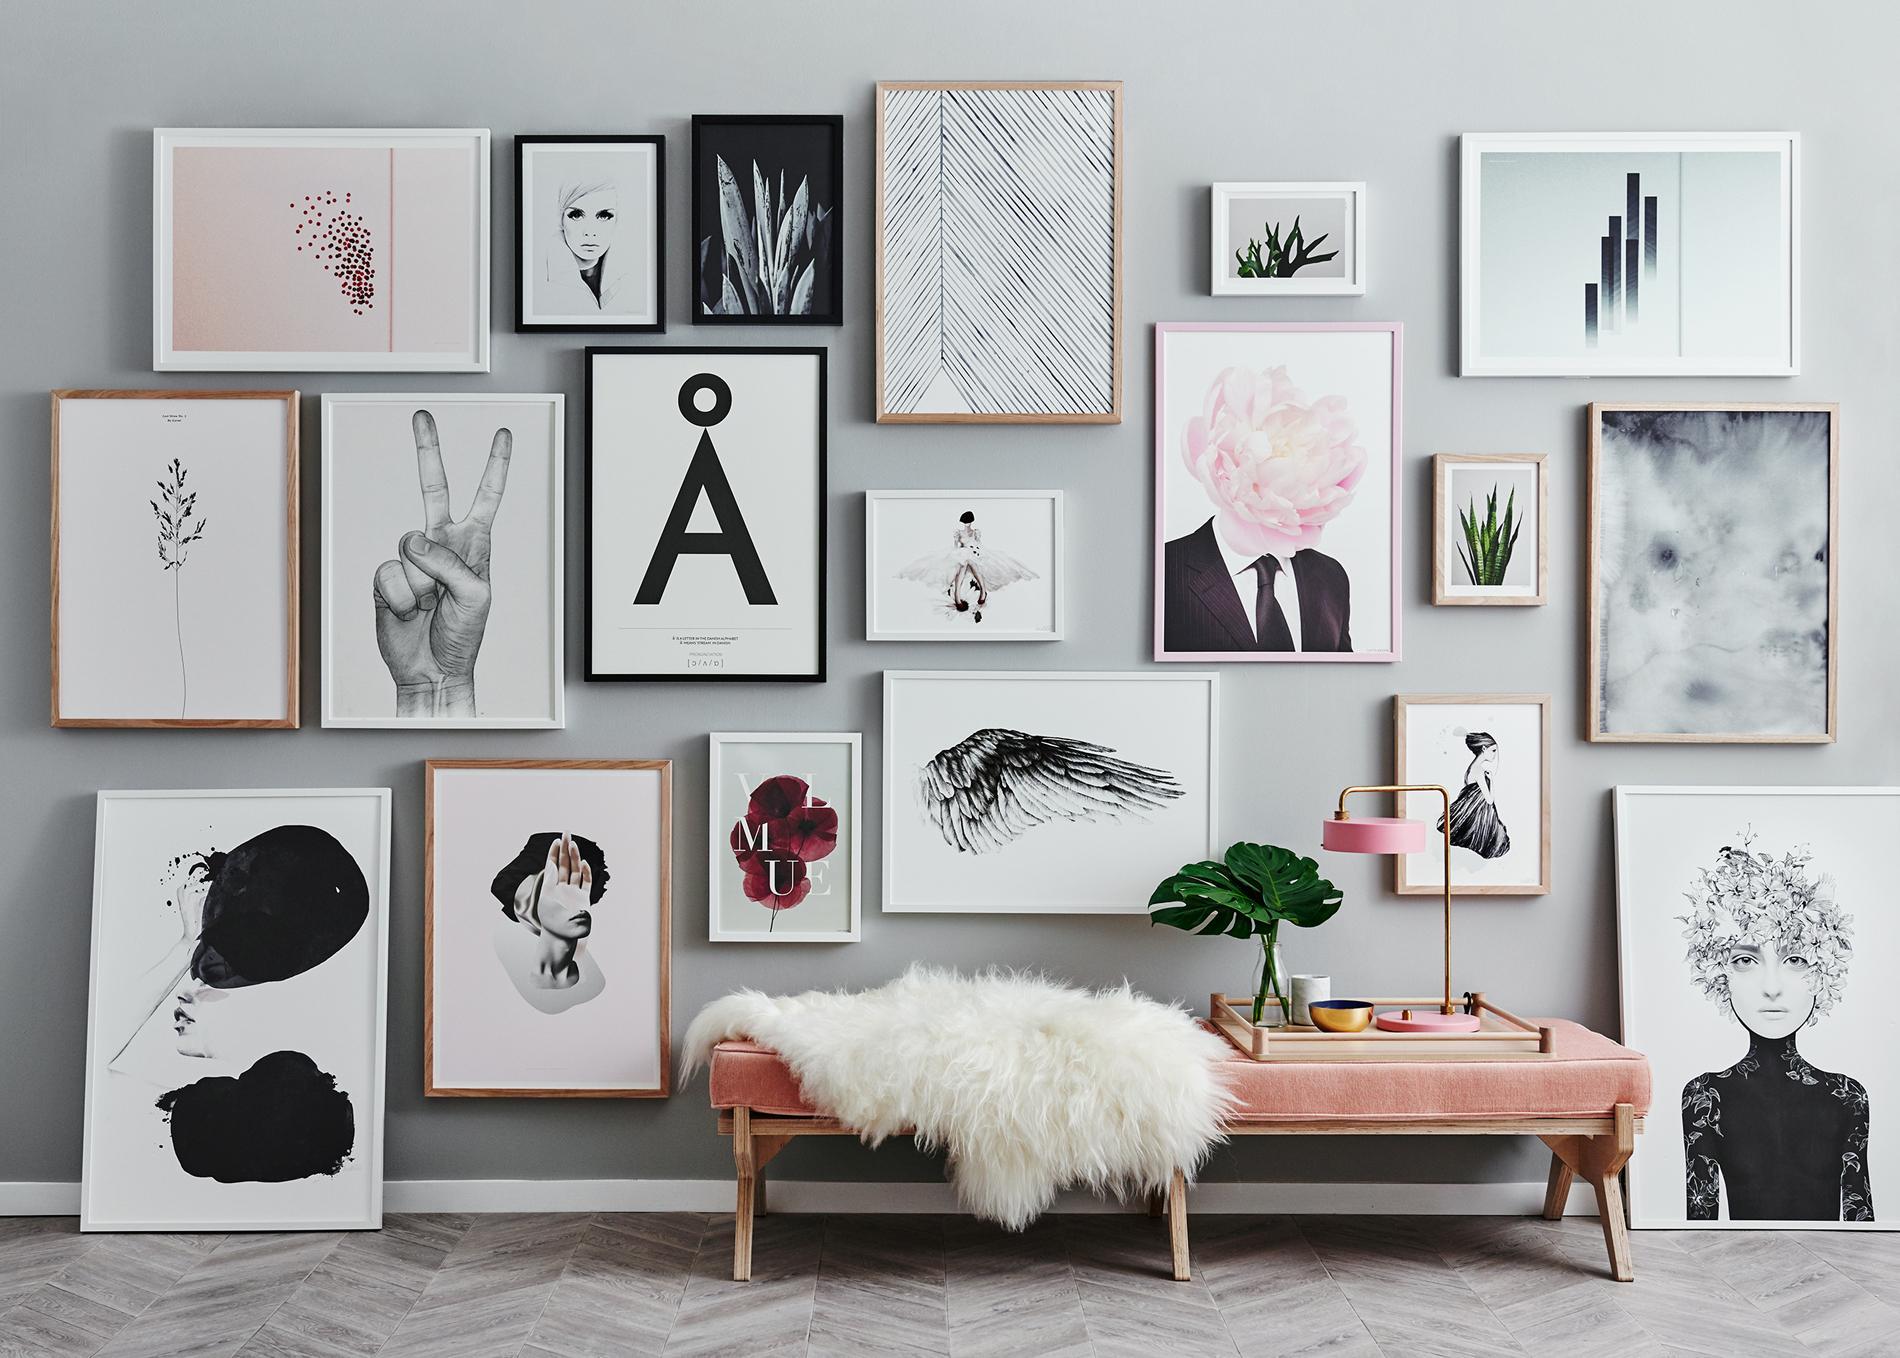 cinq conseils emprunter au home staging pour refaire sa d co madame figaro. Black Bedroom Furniture Sets. Home Design Ideas